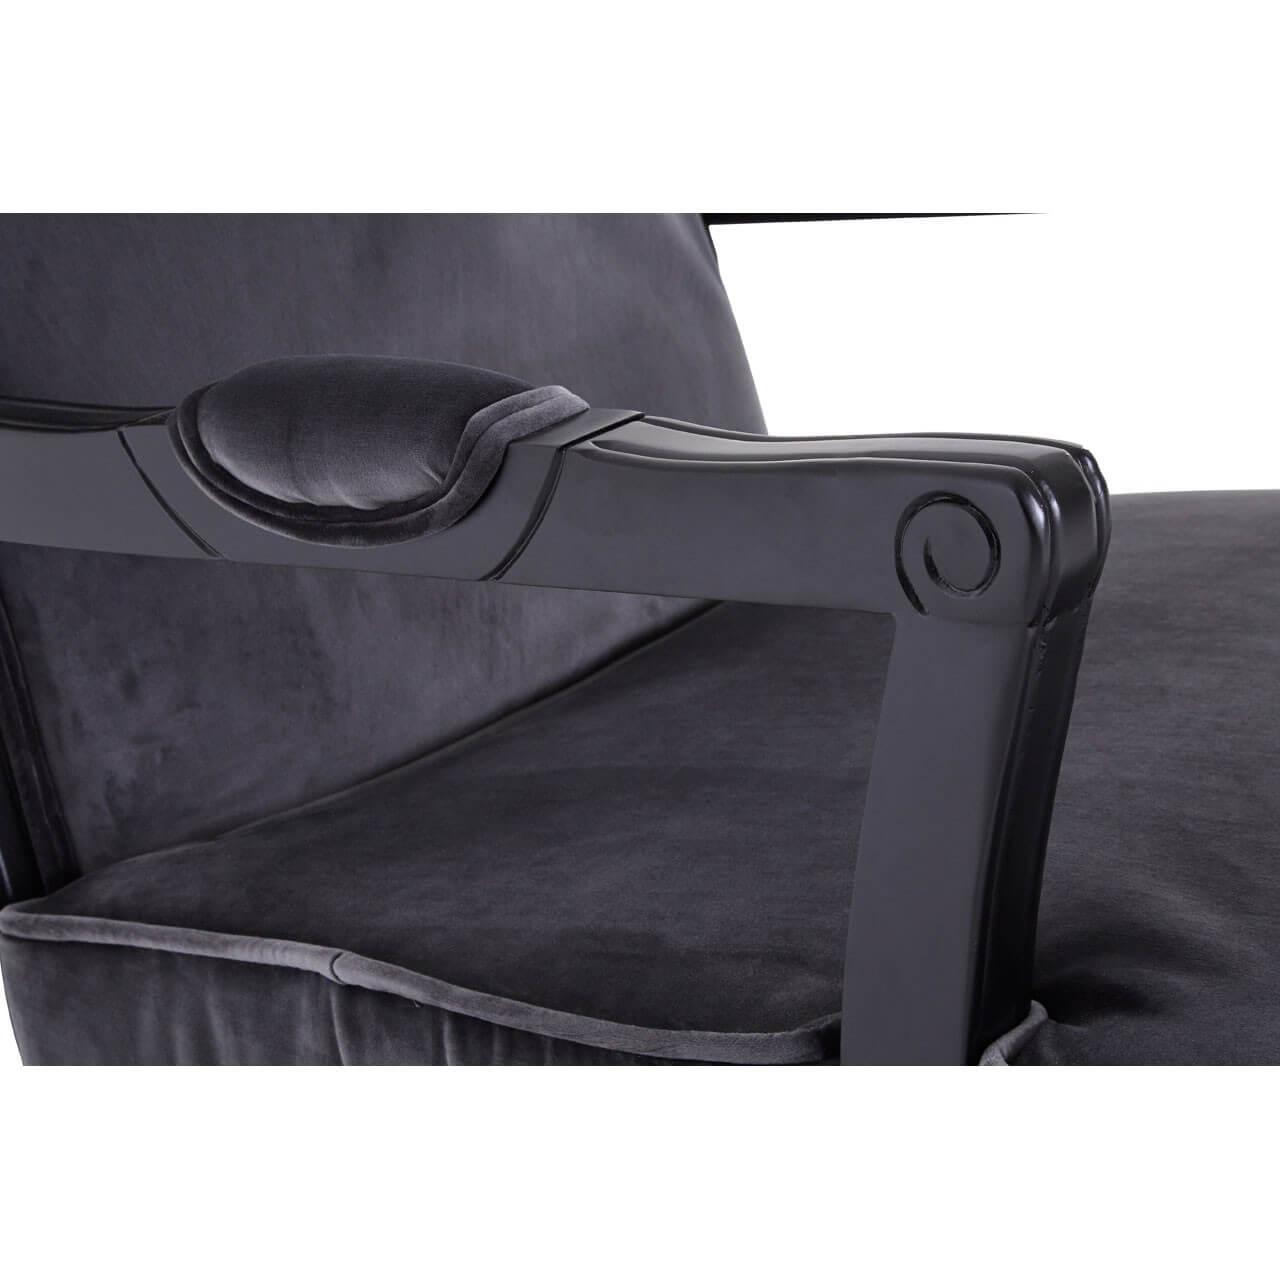 Baroque Armchair Footstool Black Grey Orange Velvet Fads # Meuble Tv Style Baroque